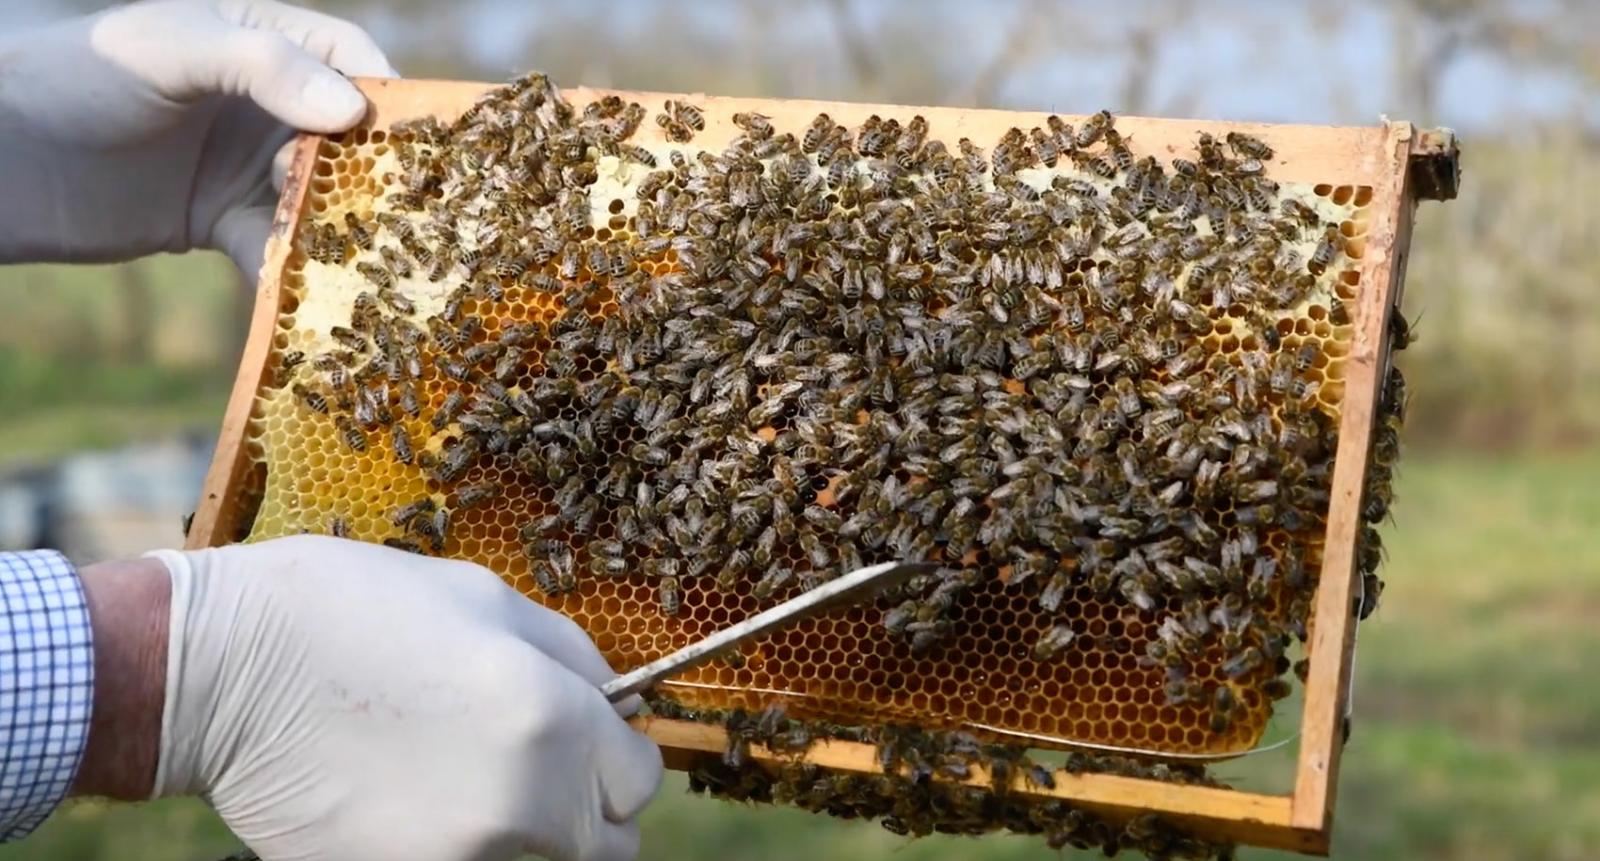 Faszination Genuss - Regionale Produkte - Mosel Honig